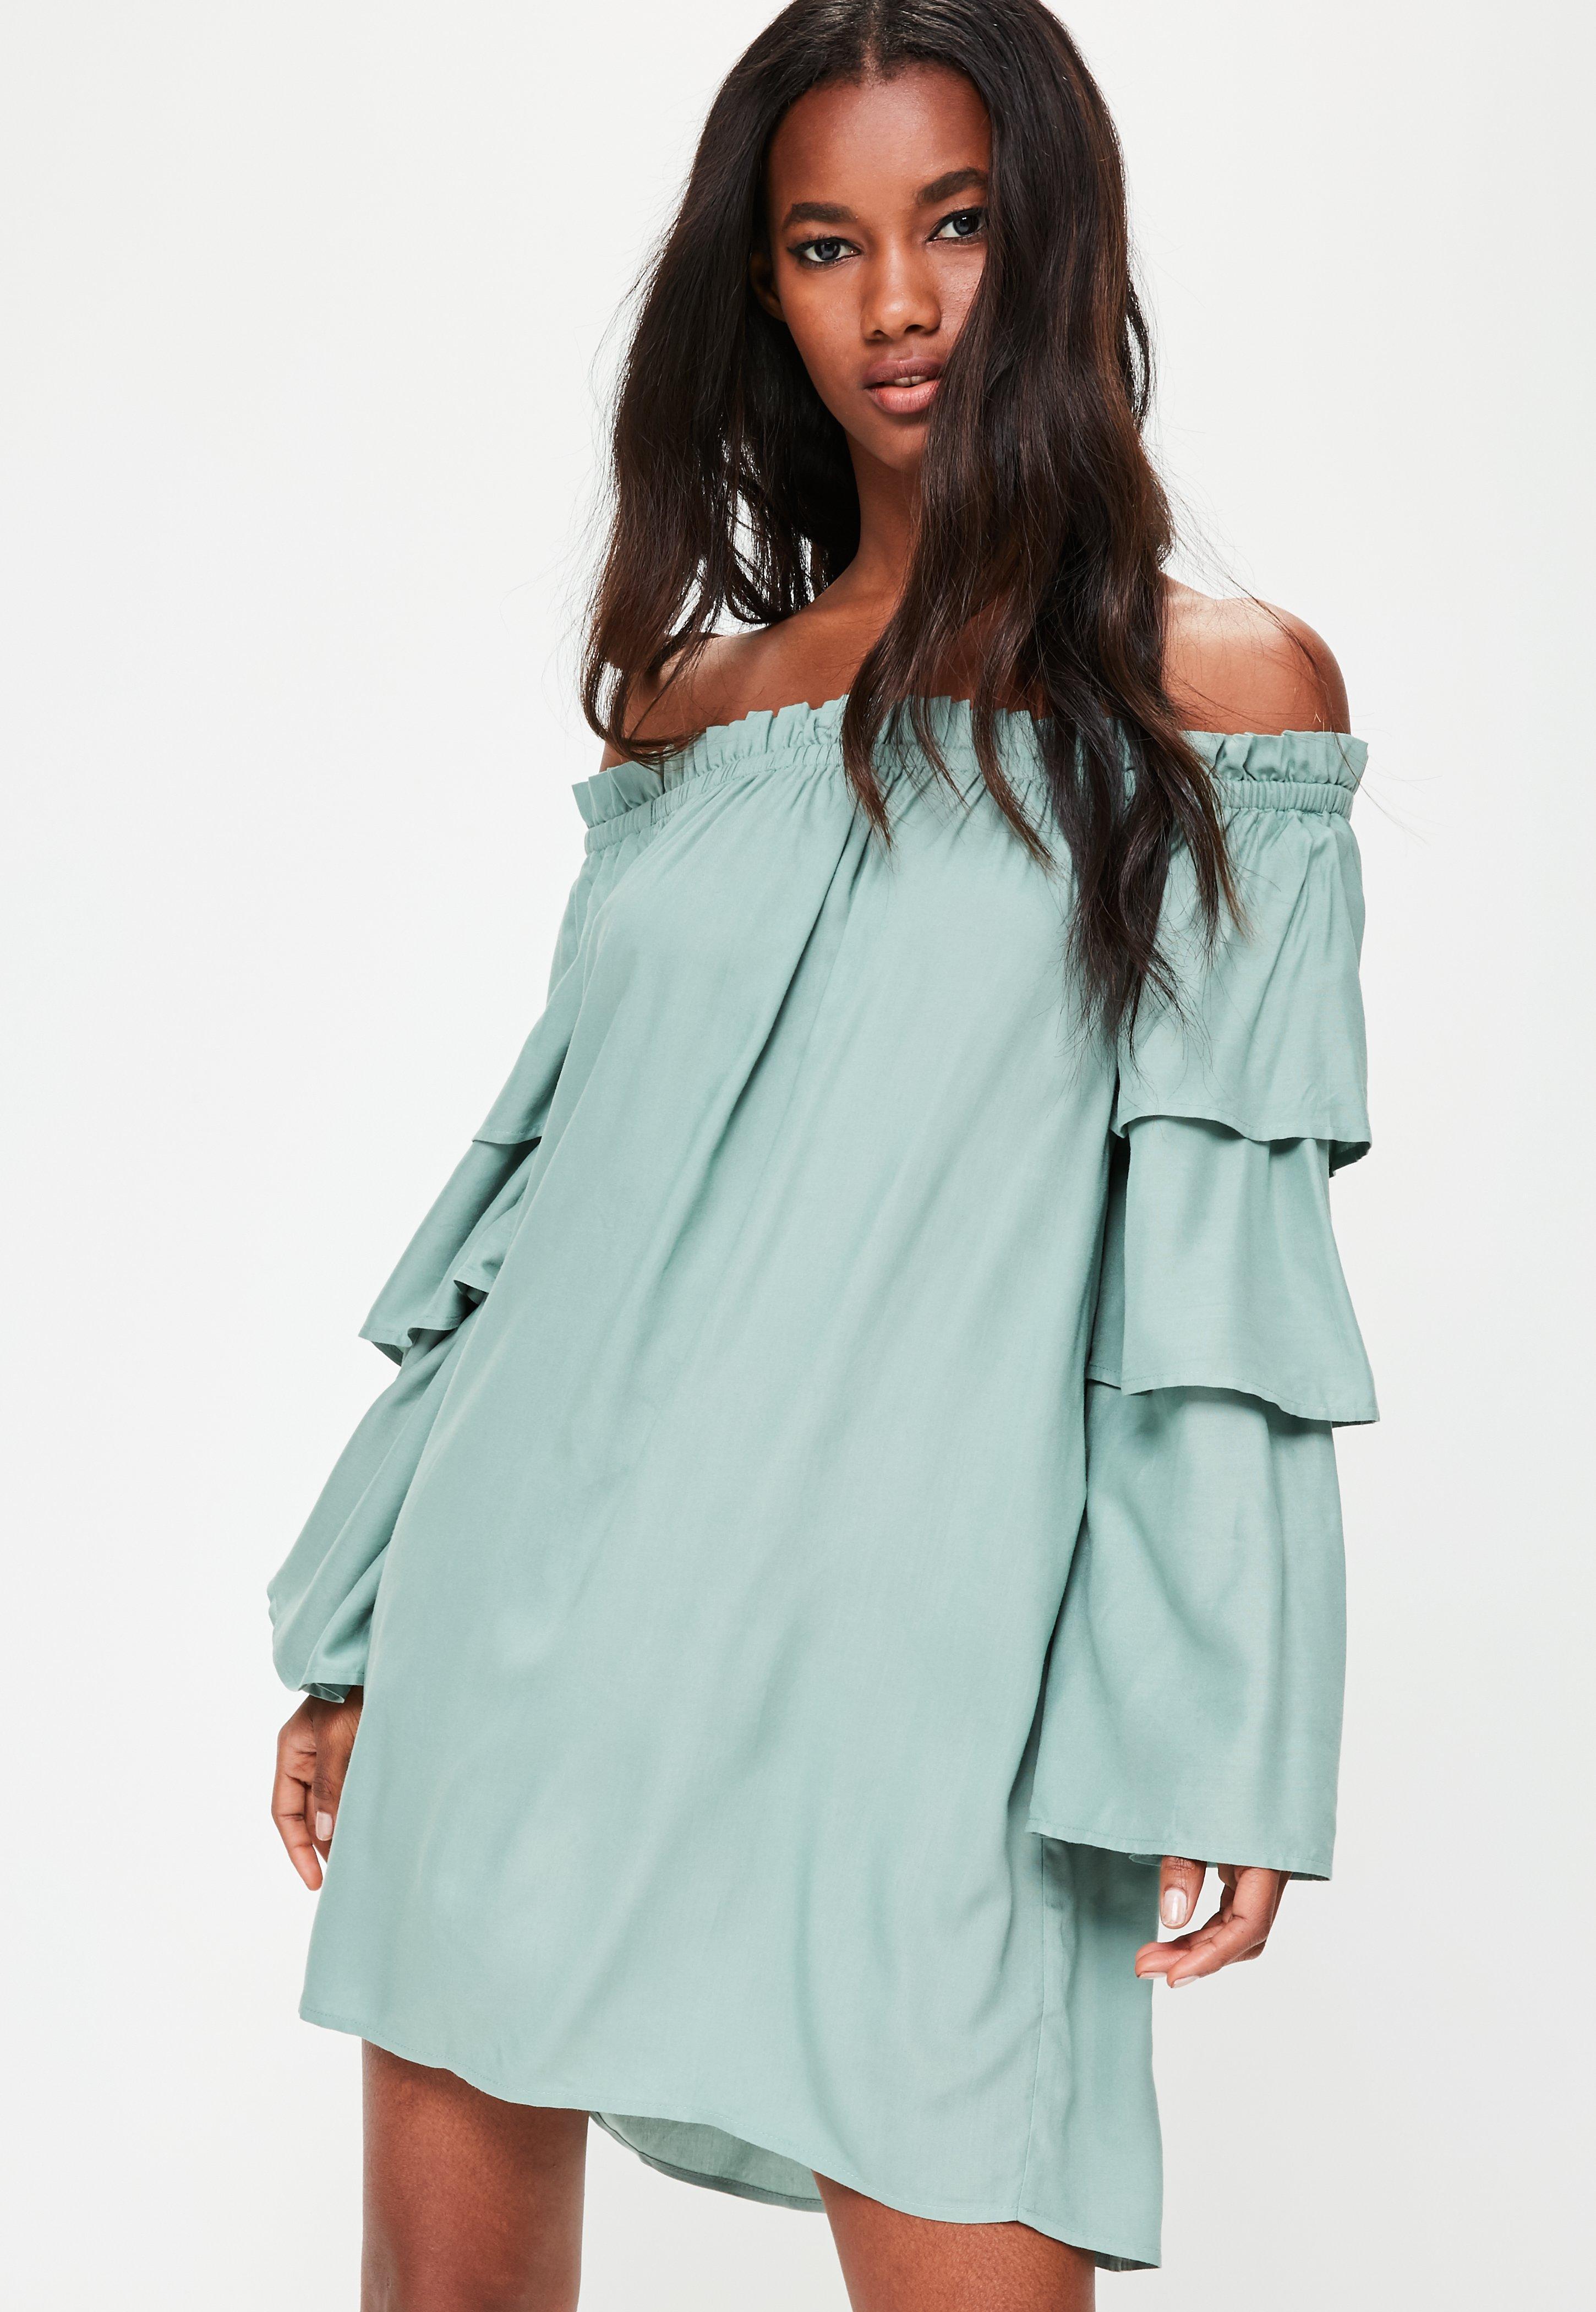 7817fbc65008 Lyst - Missguided Green Layered Sleeve Bardot Shift Dress in Green